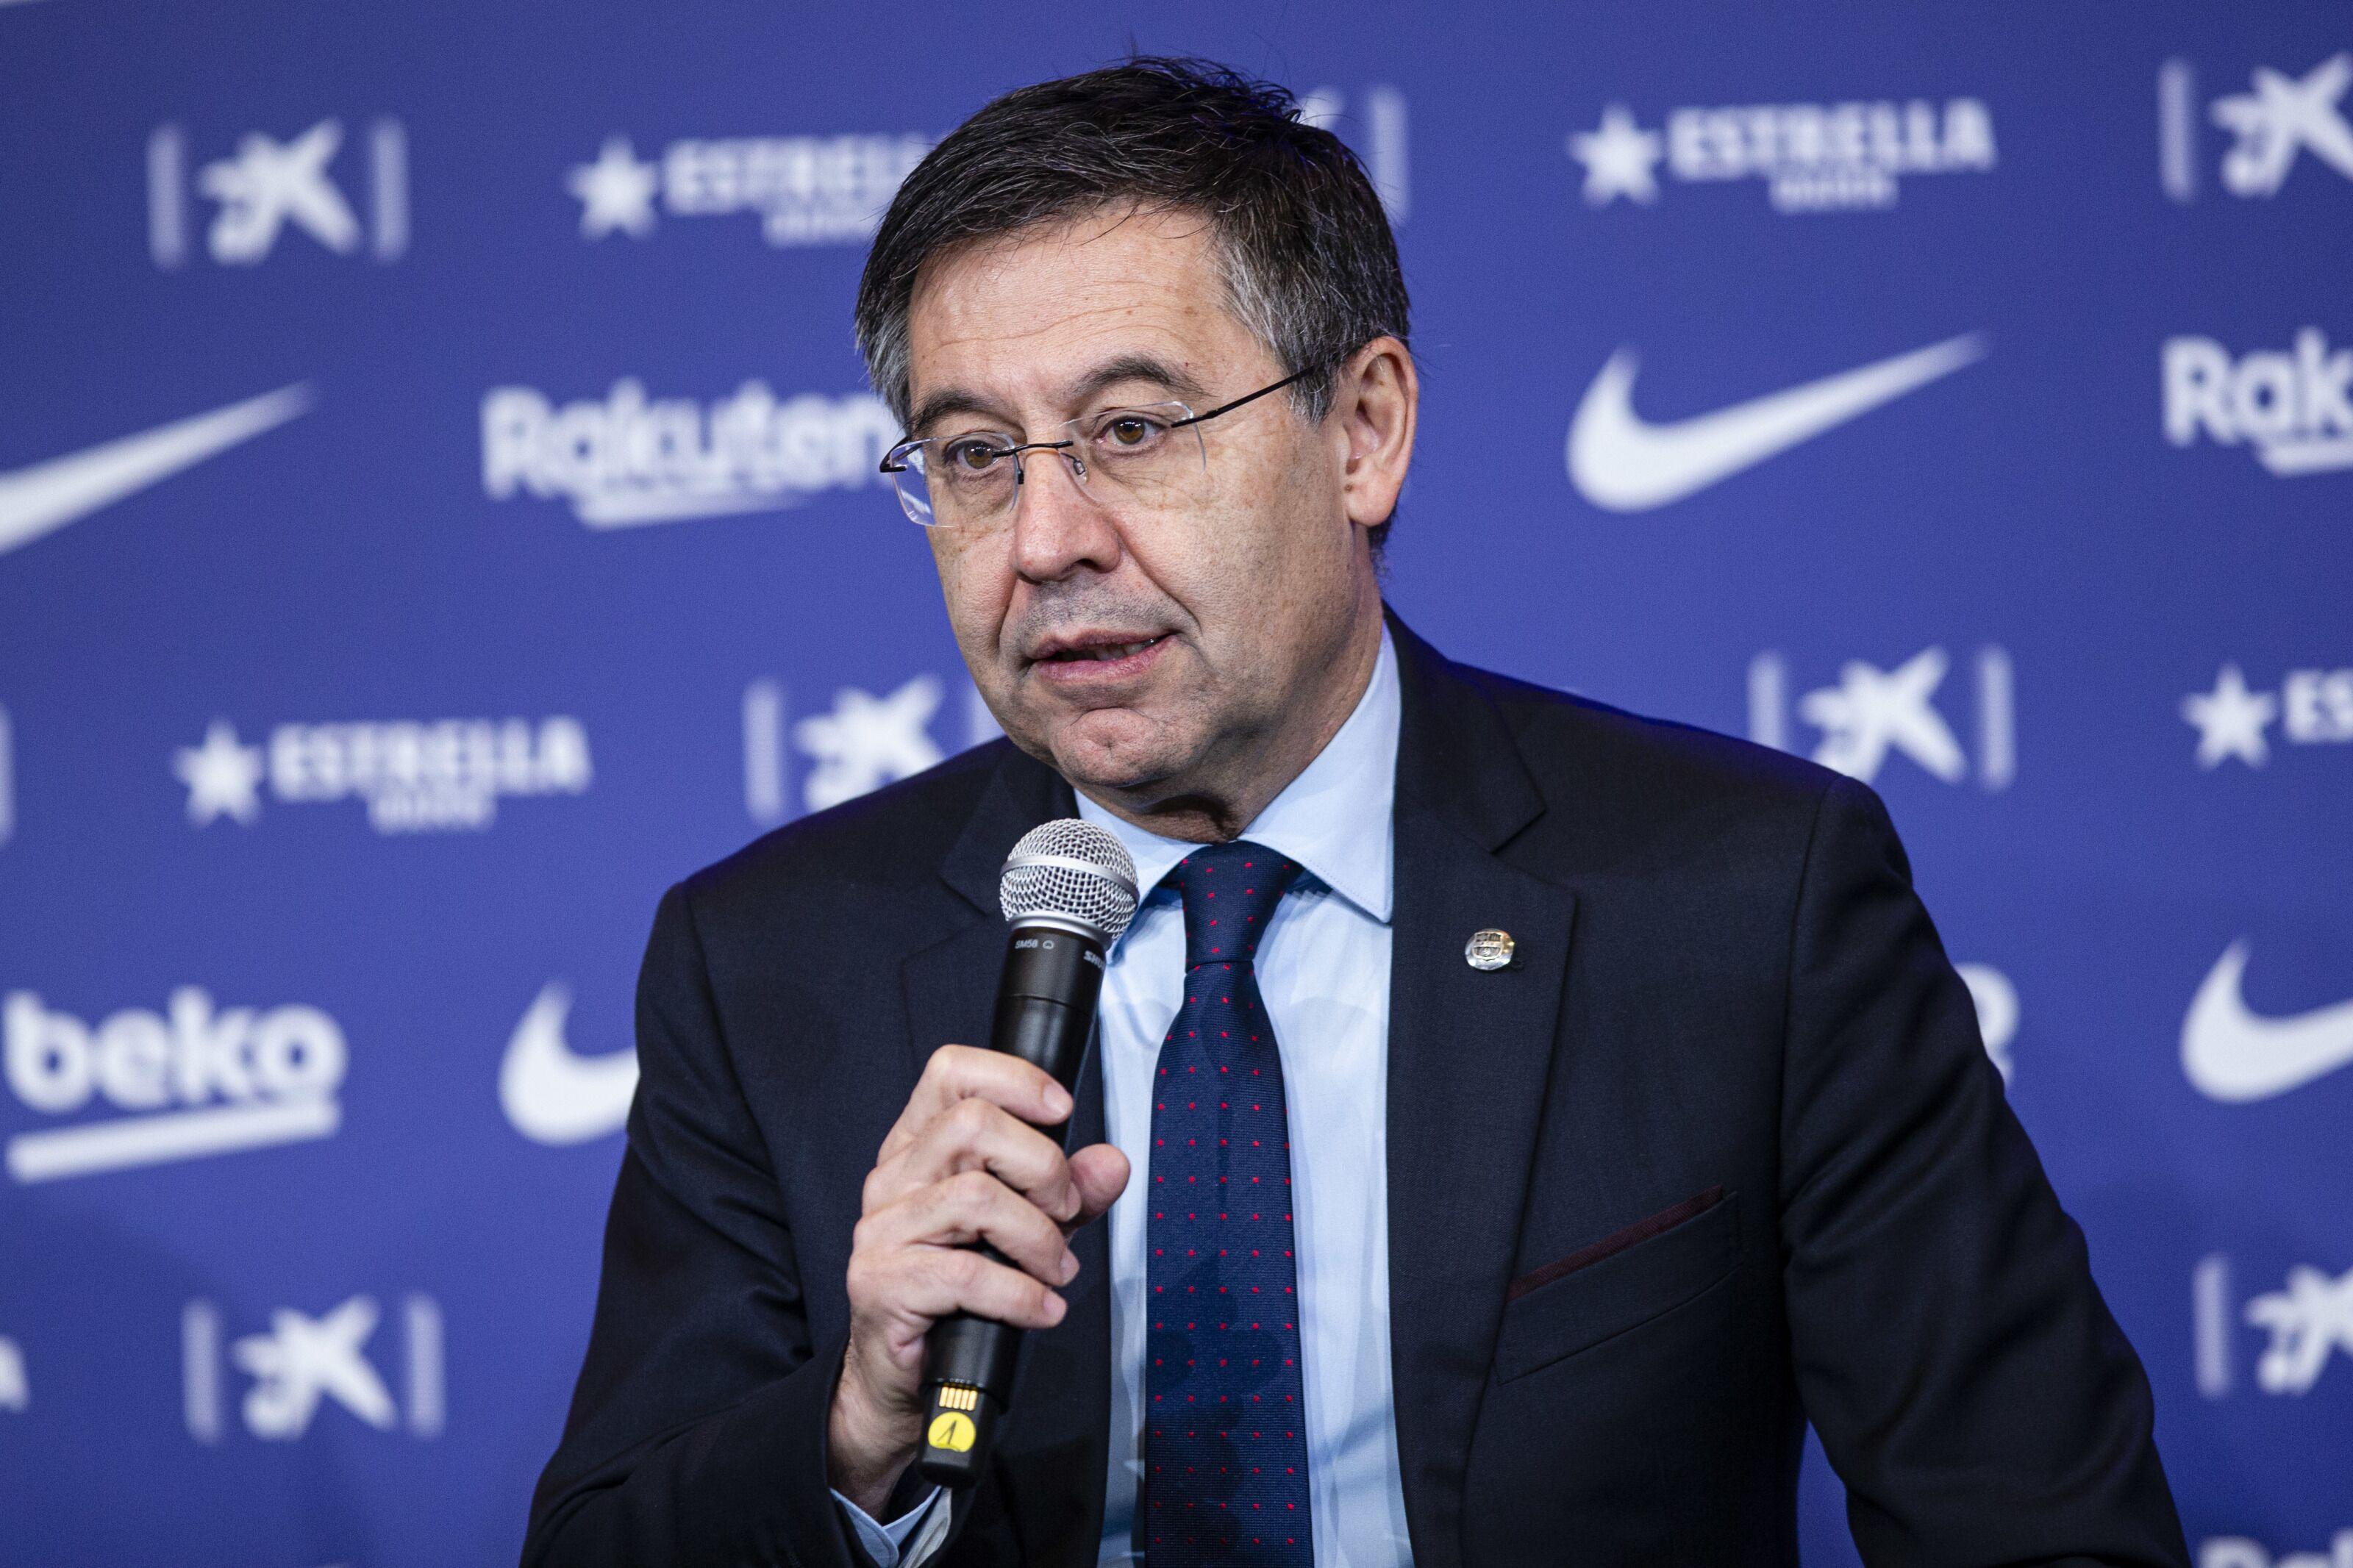 Barcelona president lavishly gifts squad members despite recent form